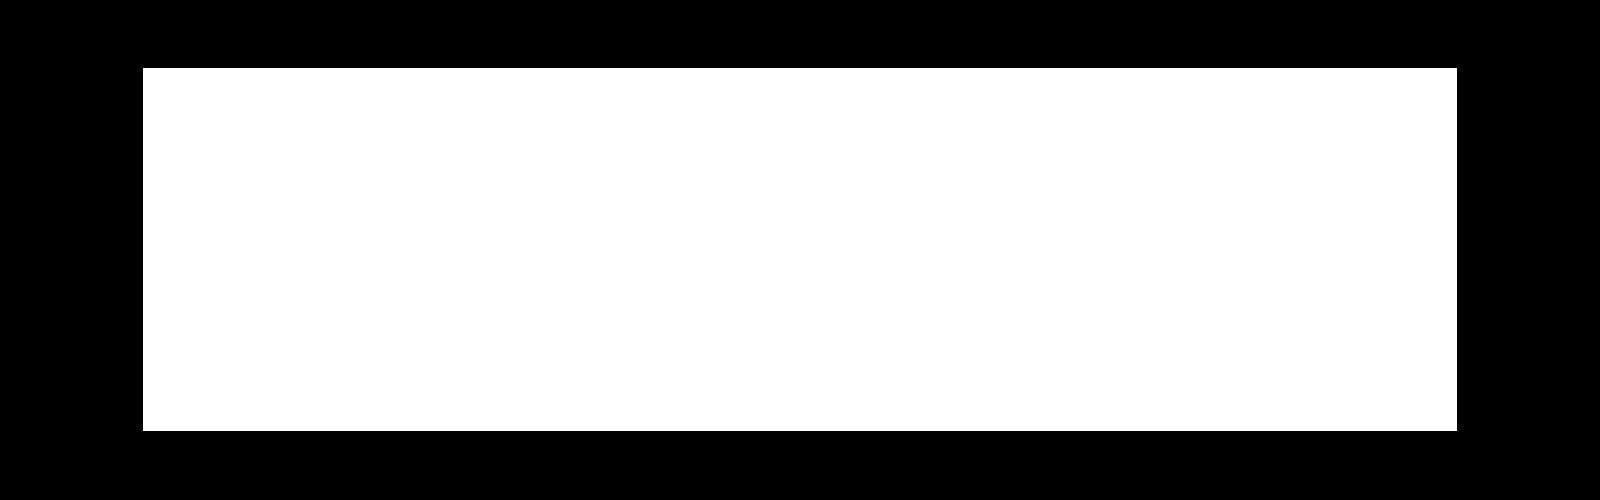 JS-Icons